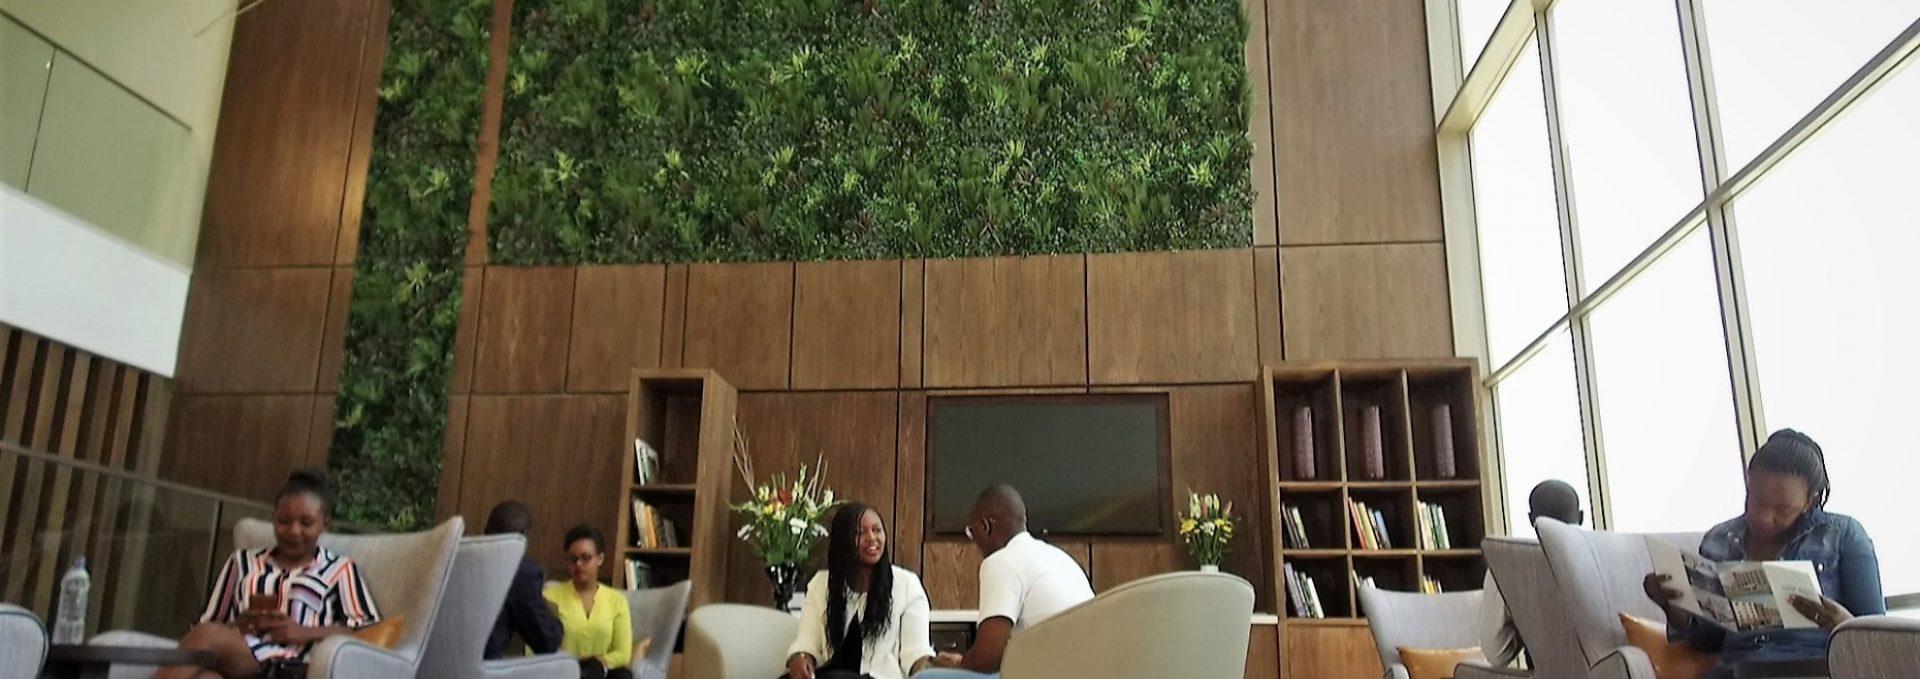 Airport Green Walls